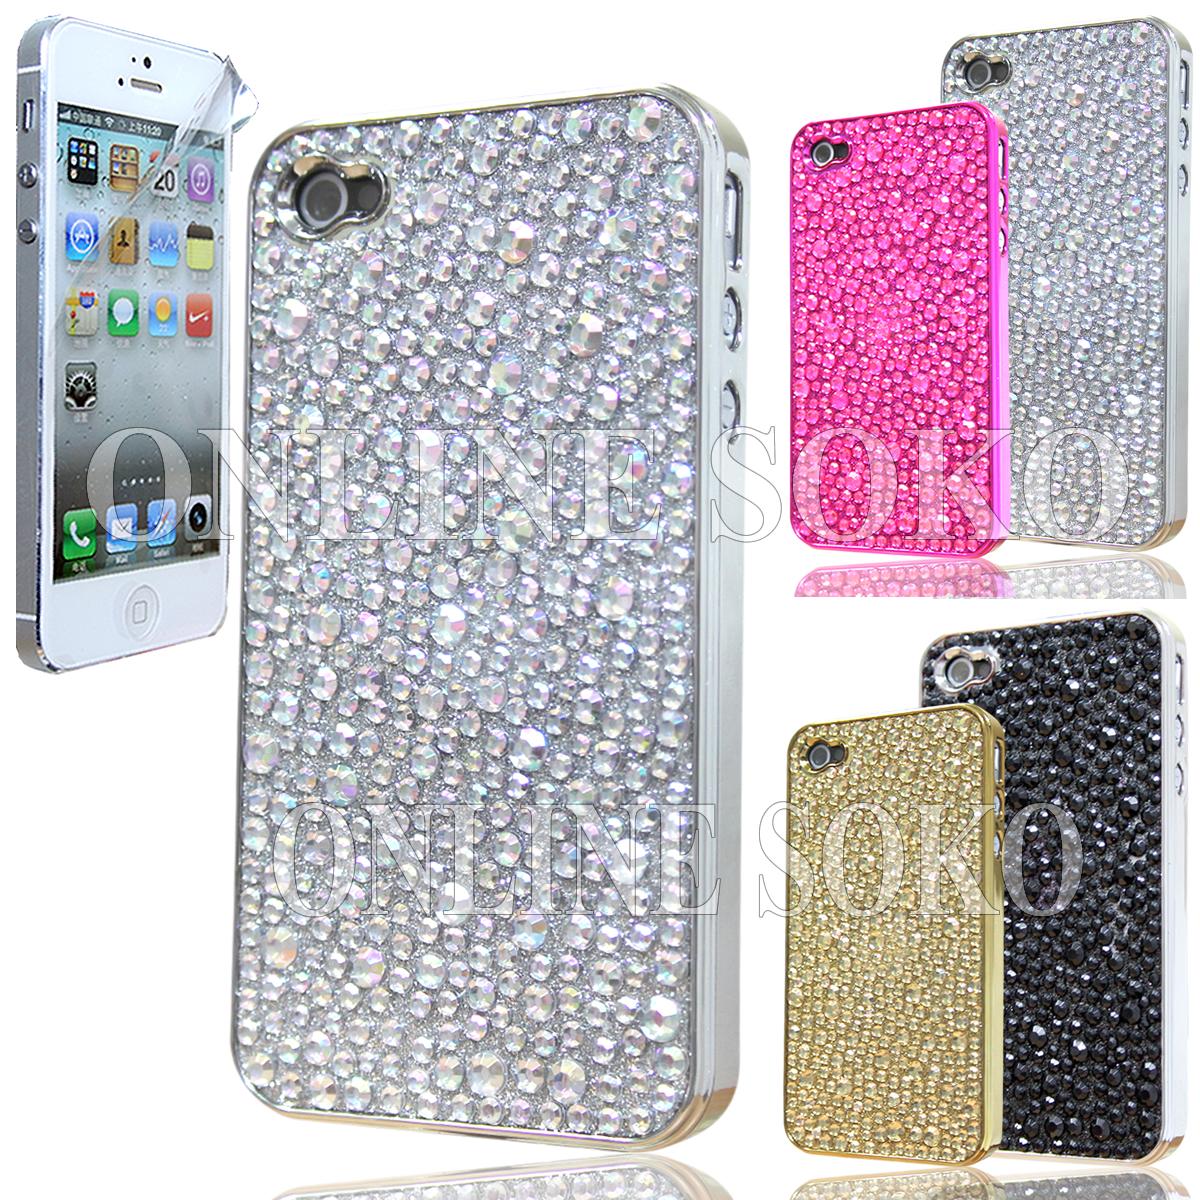 FOR APPLE iPHONE 5 CRYSTAL DIAMOND BLING CASE RHINESTONE DIAMANTE HARD COVER | eBay